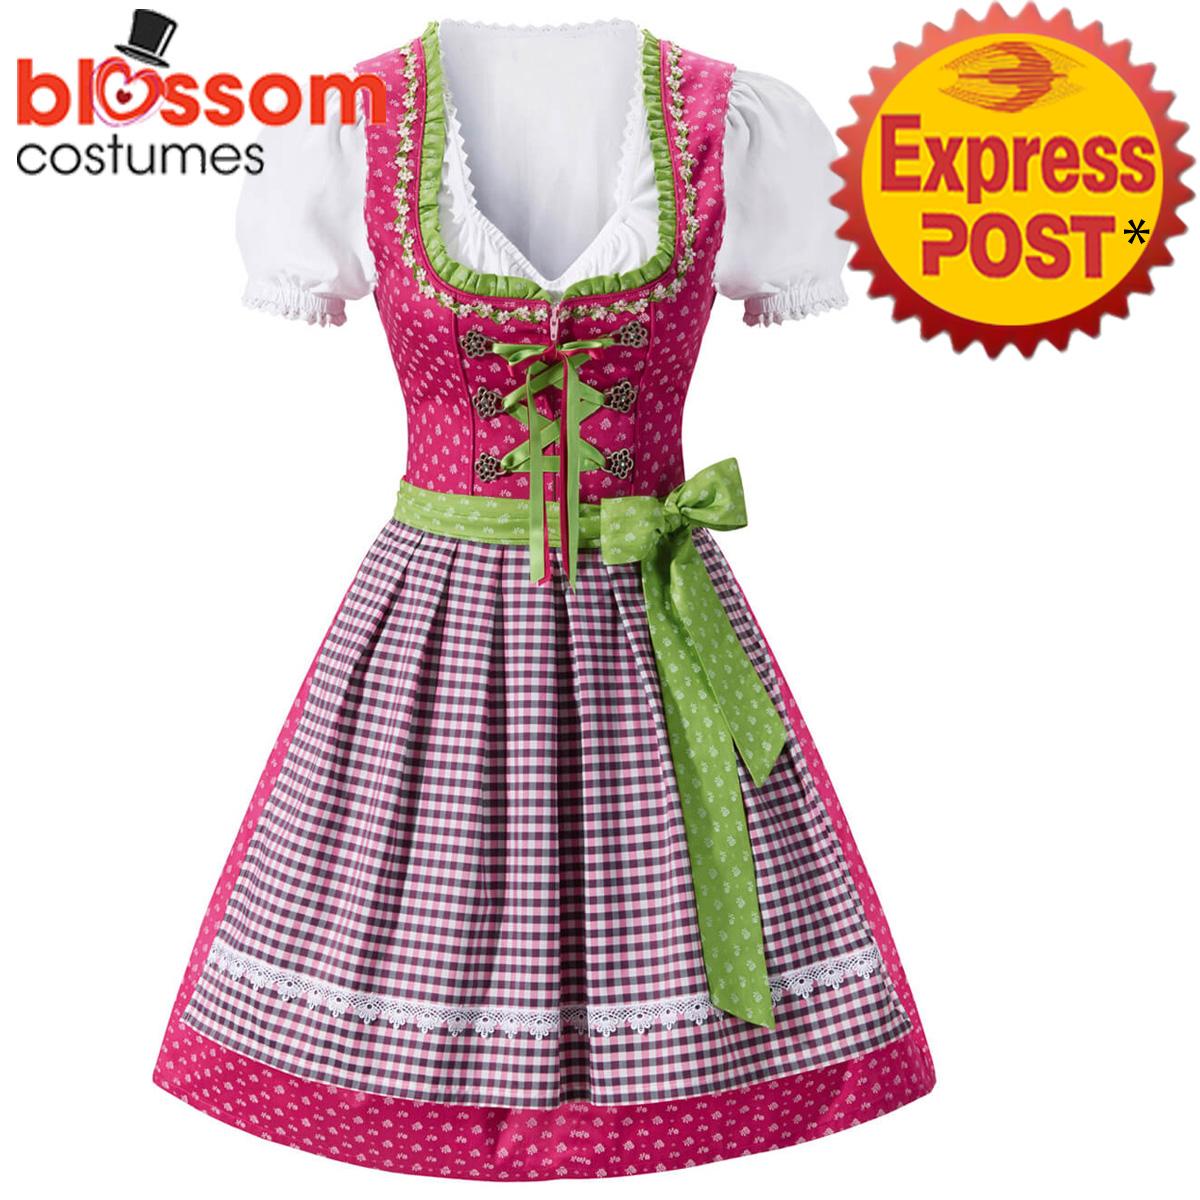 K391-Ladies-Oktoberfest-Beer-Maid-Costume-Bavarian-German-Dirdnl-Lederhosen